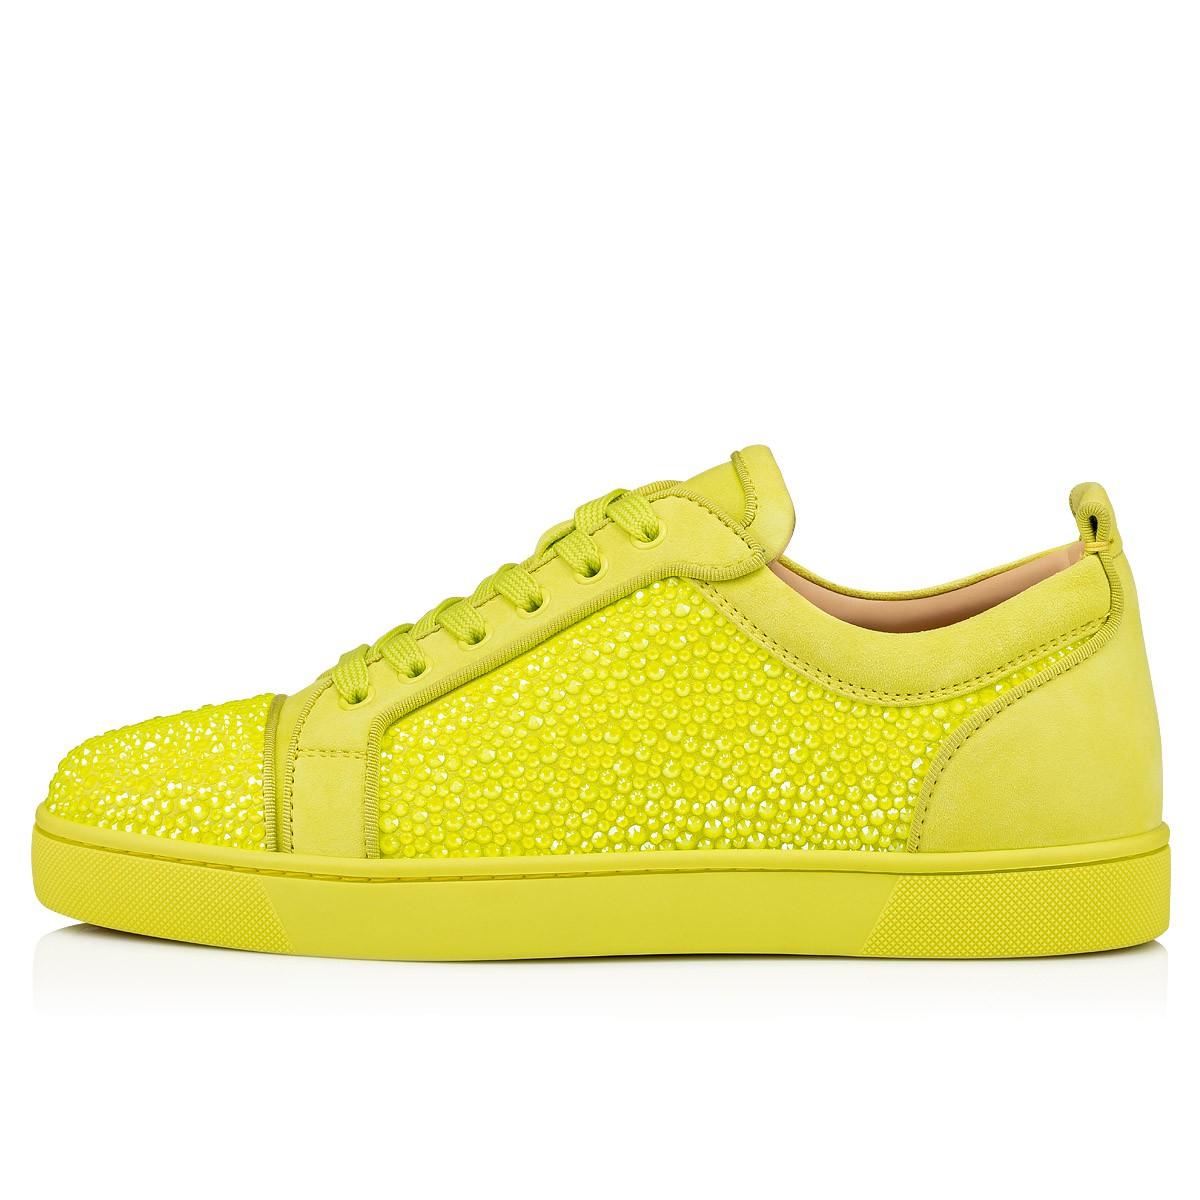 Shoes - Louis Junior Orlato Strass - Christian Louboutin